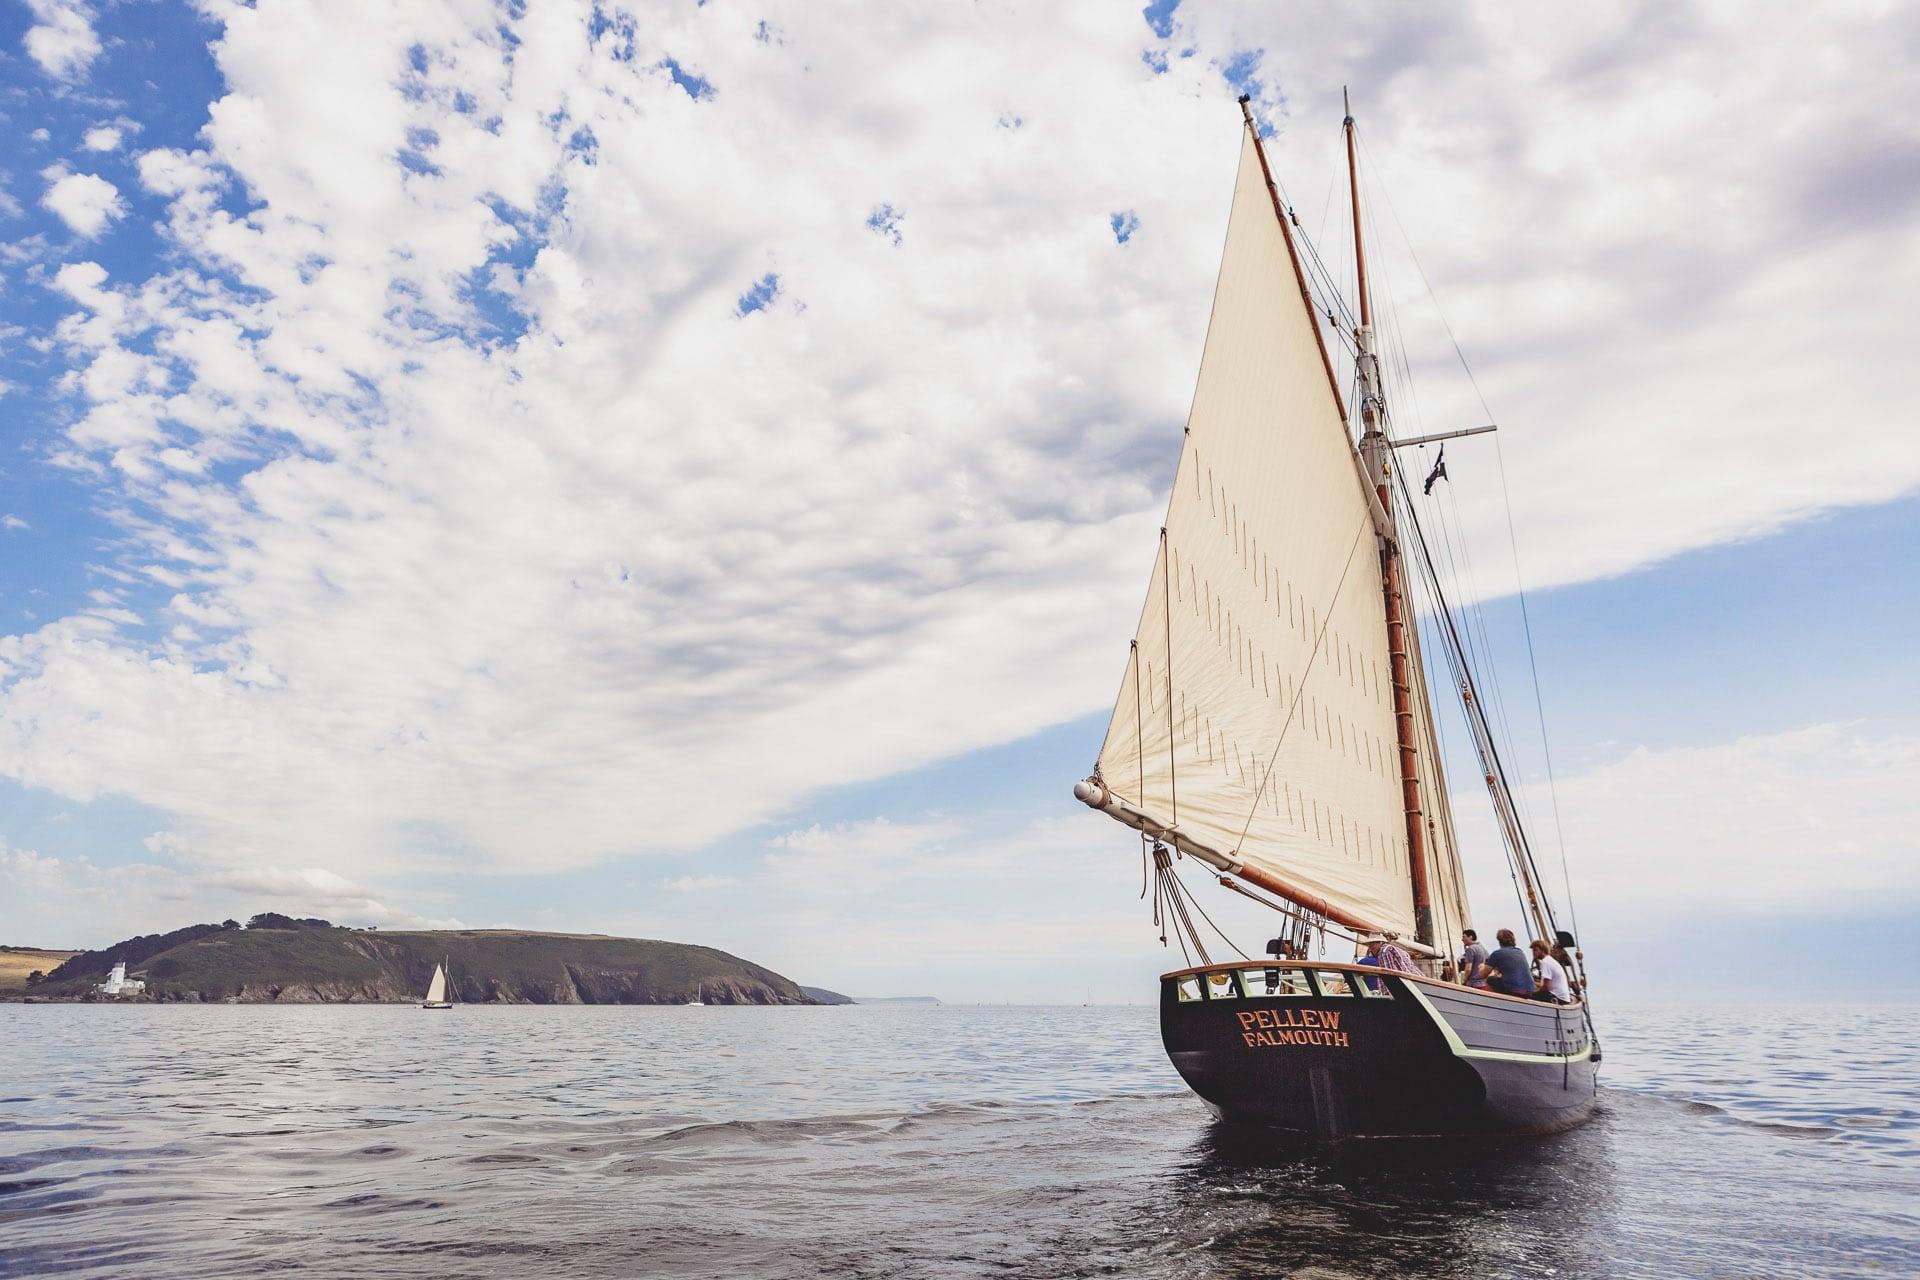 Pellew sailing stern Cornwall Falmouth bay